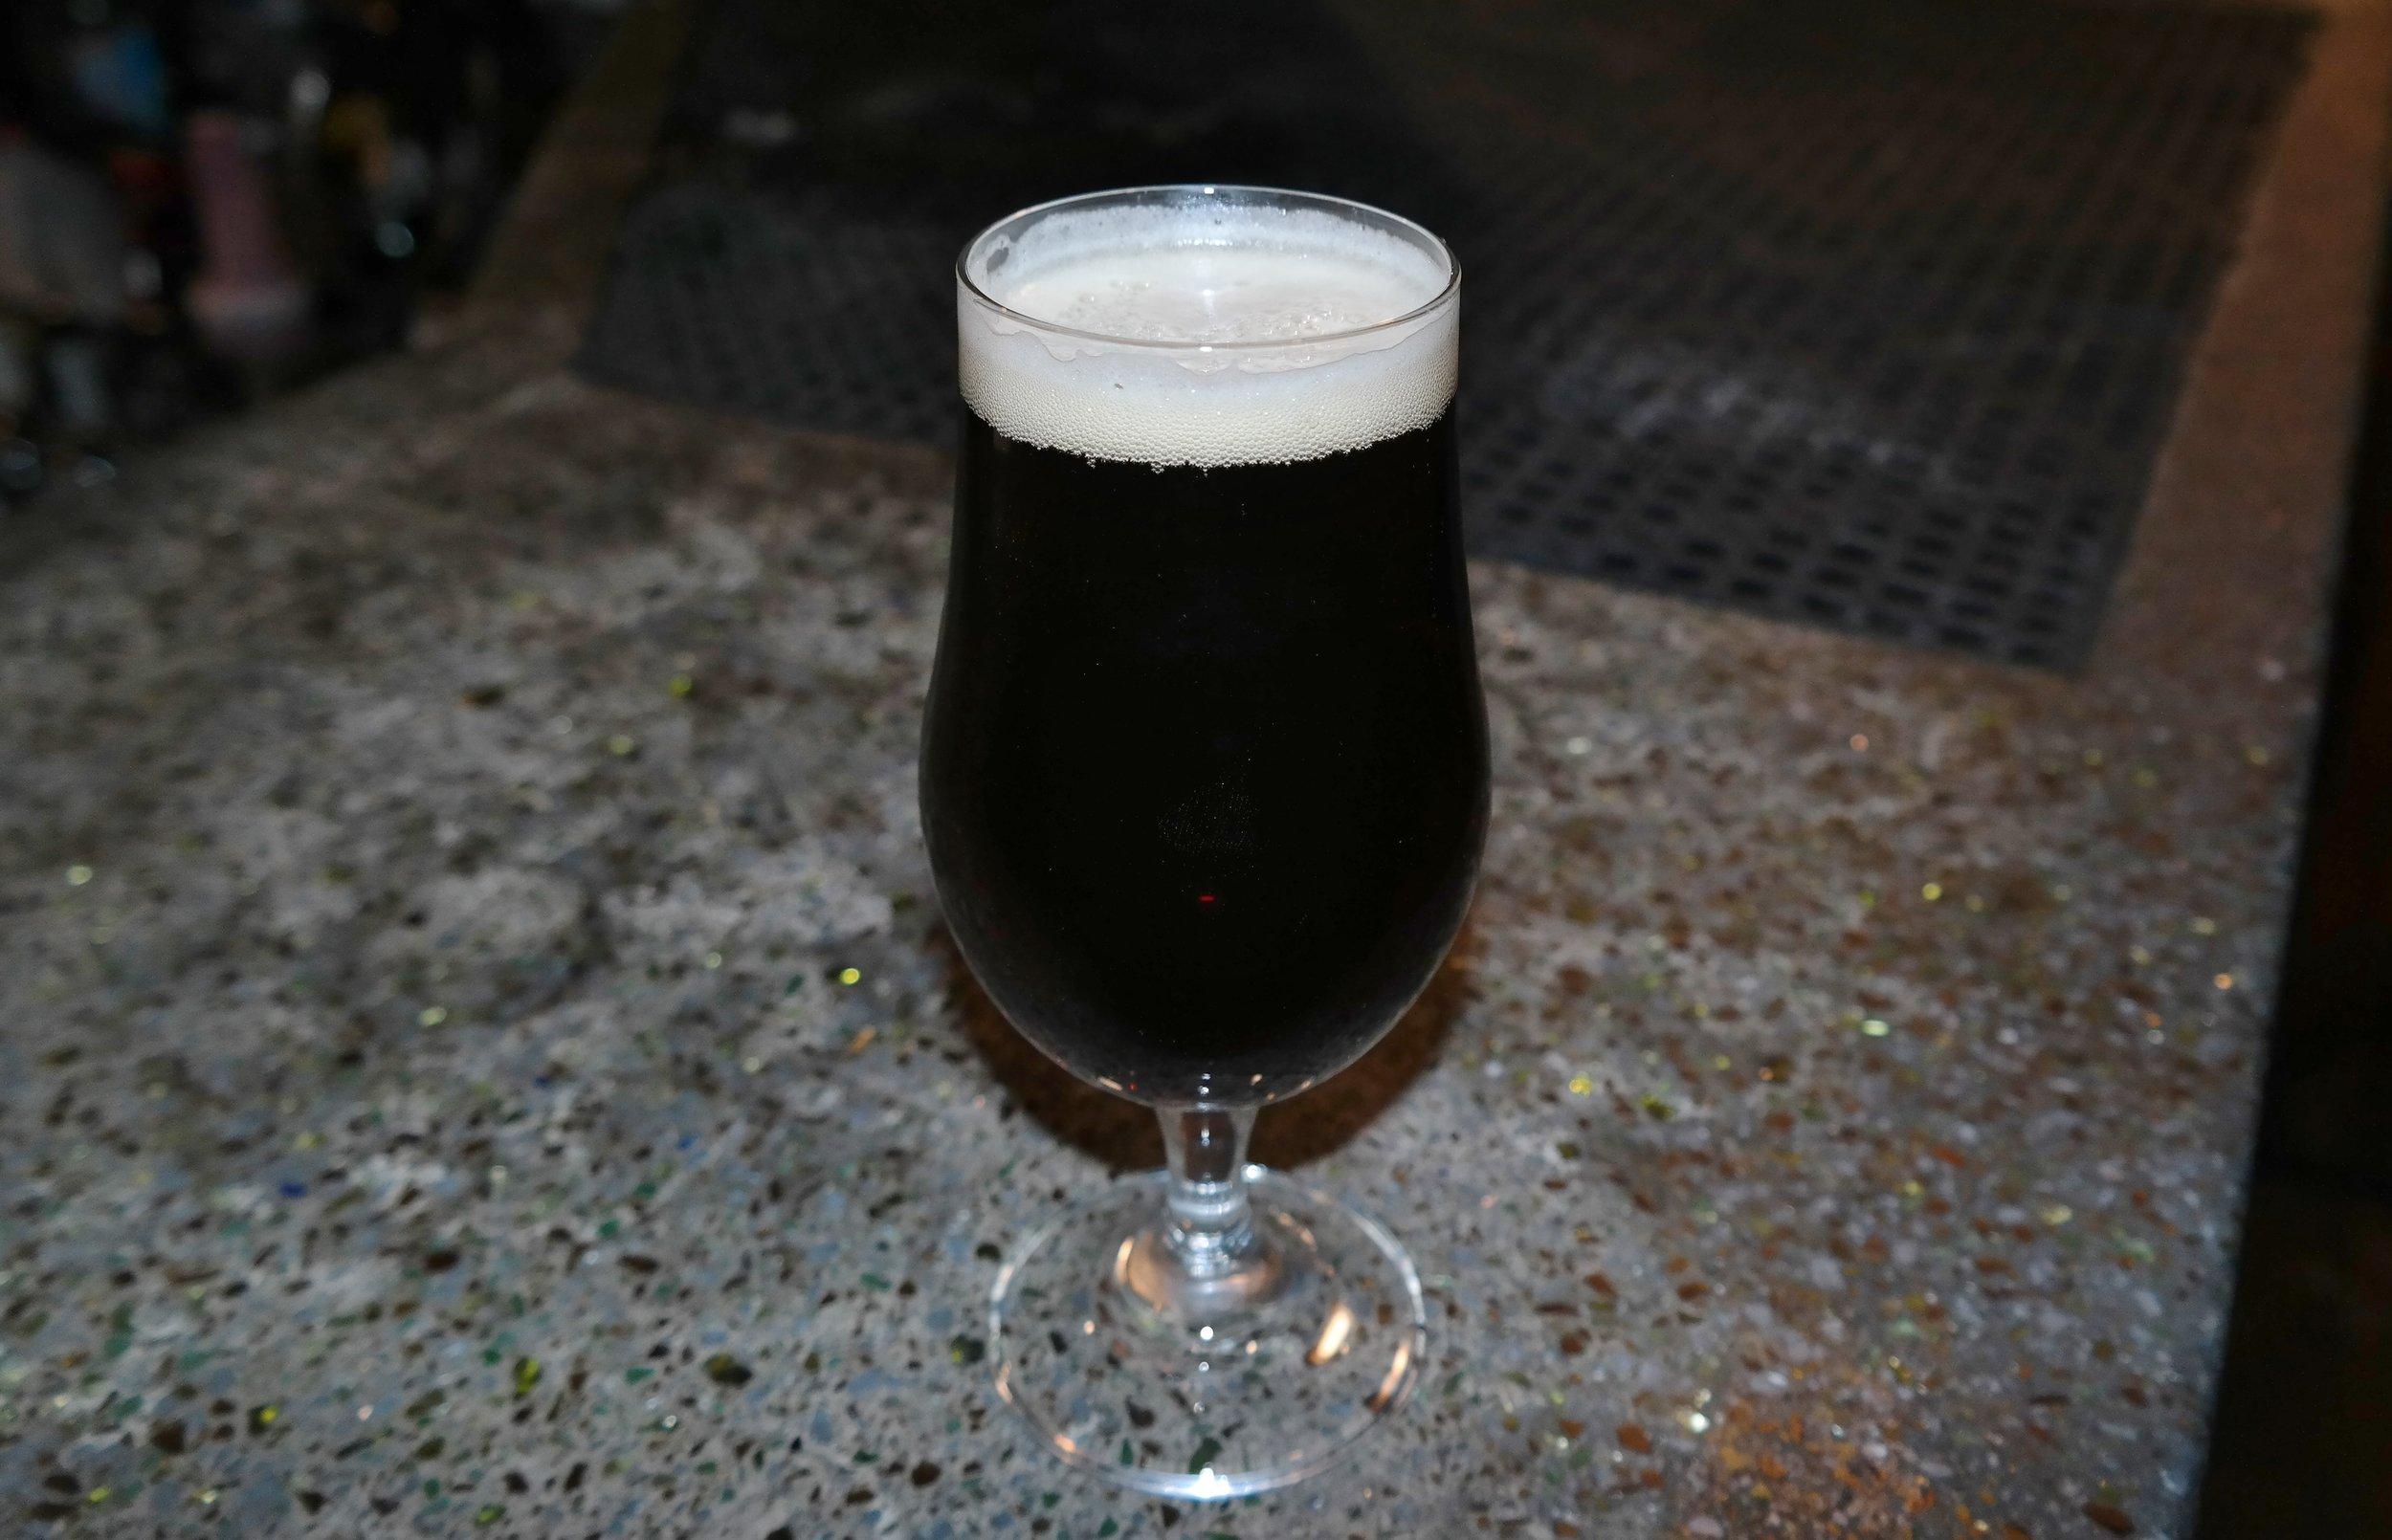 Lumberyard Brewing Company Snowbound Scotch red ale